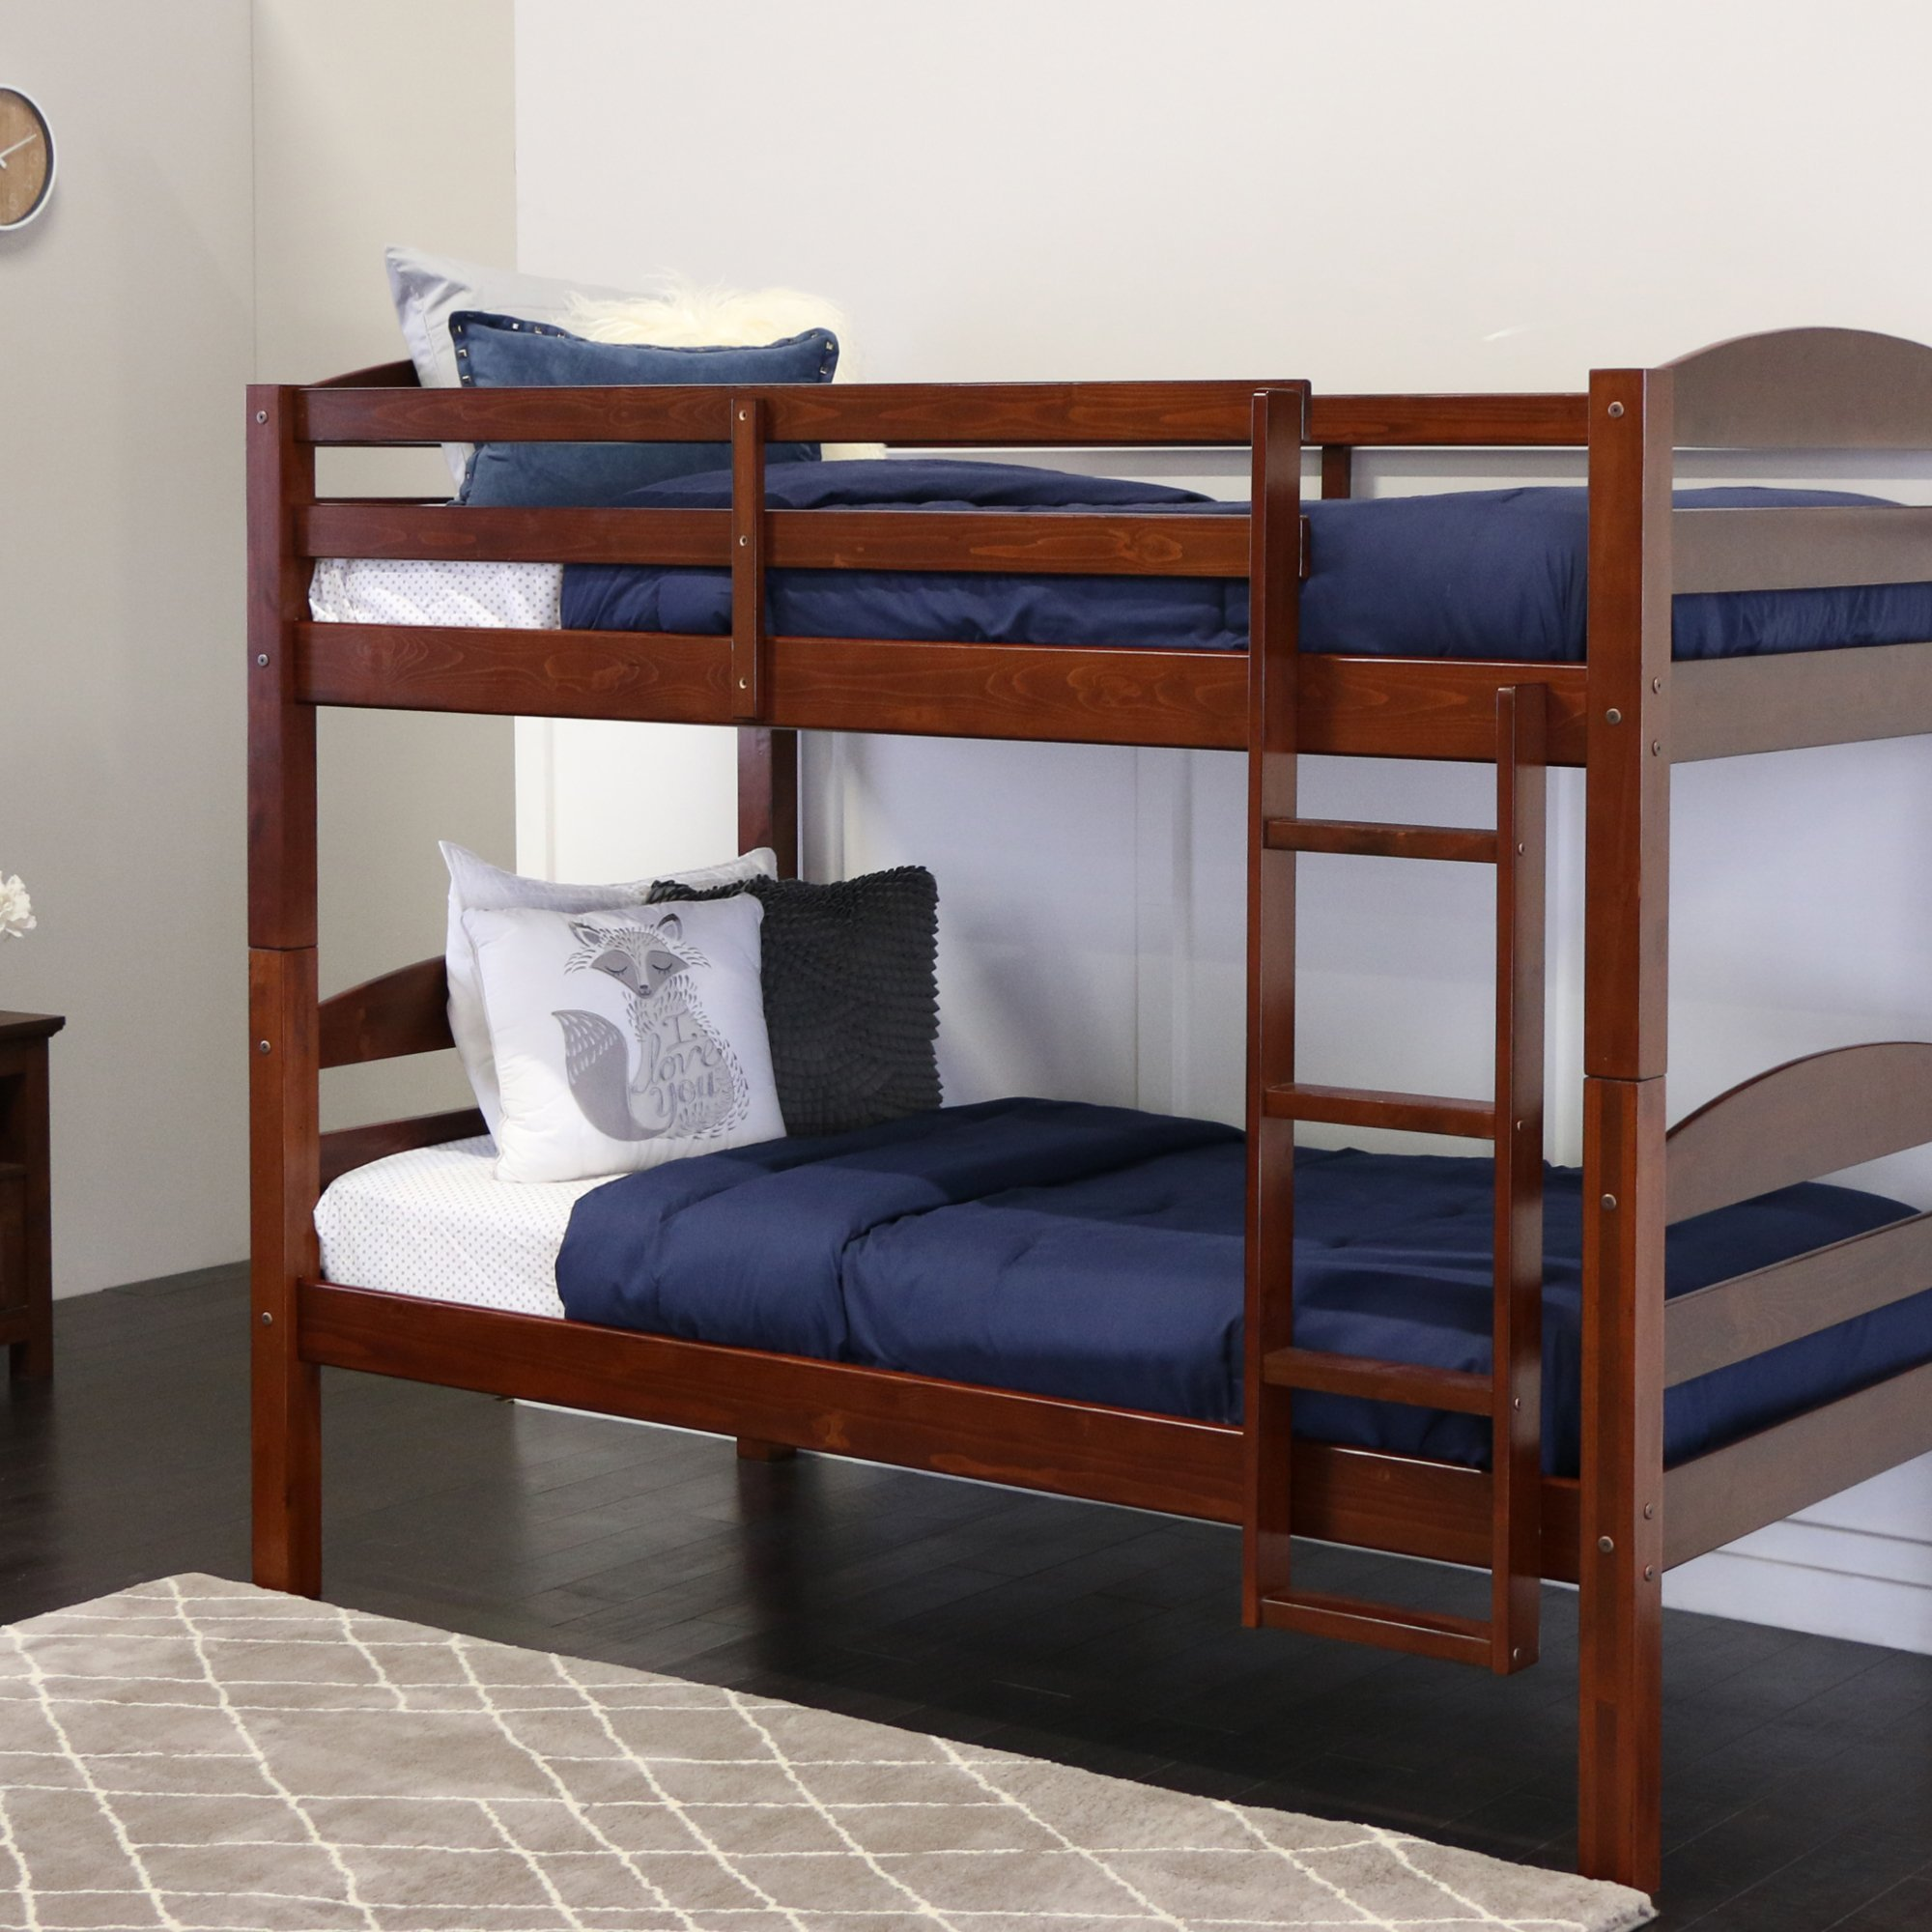 Walker Edison AZWSTOTES Wesley Wood Bunk Bed, Twin, Espresso by Walker Edison Furniture Company